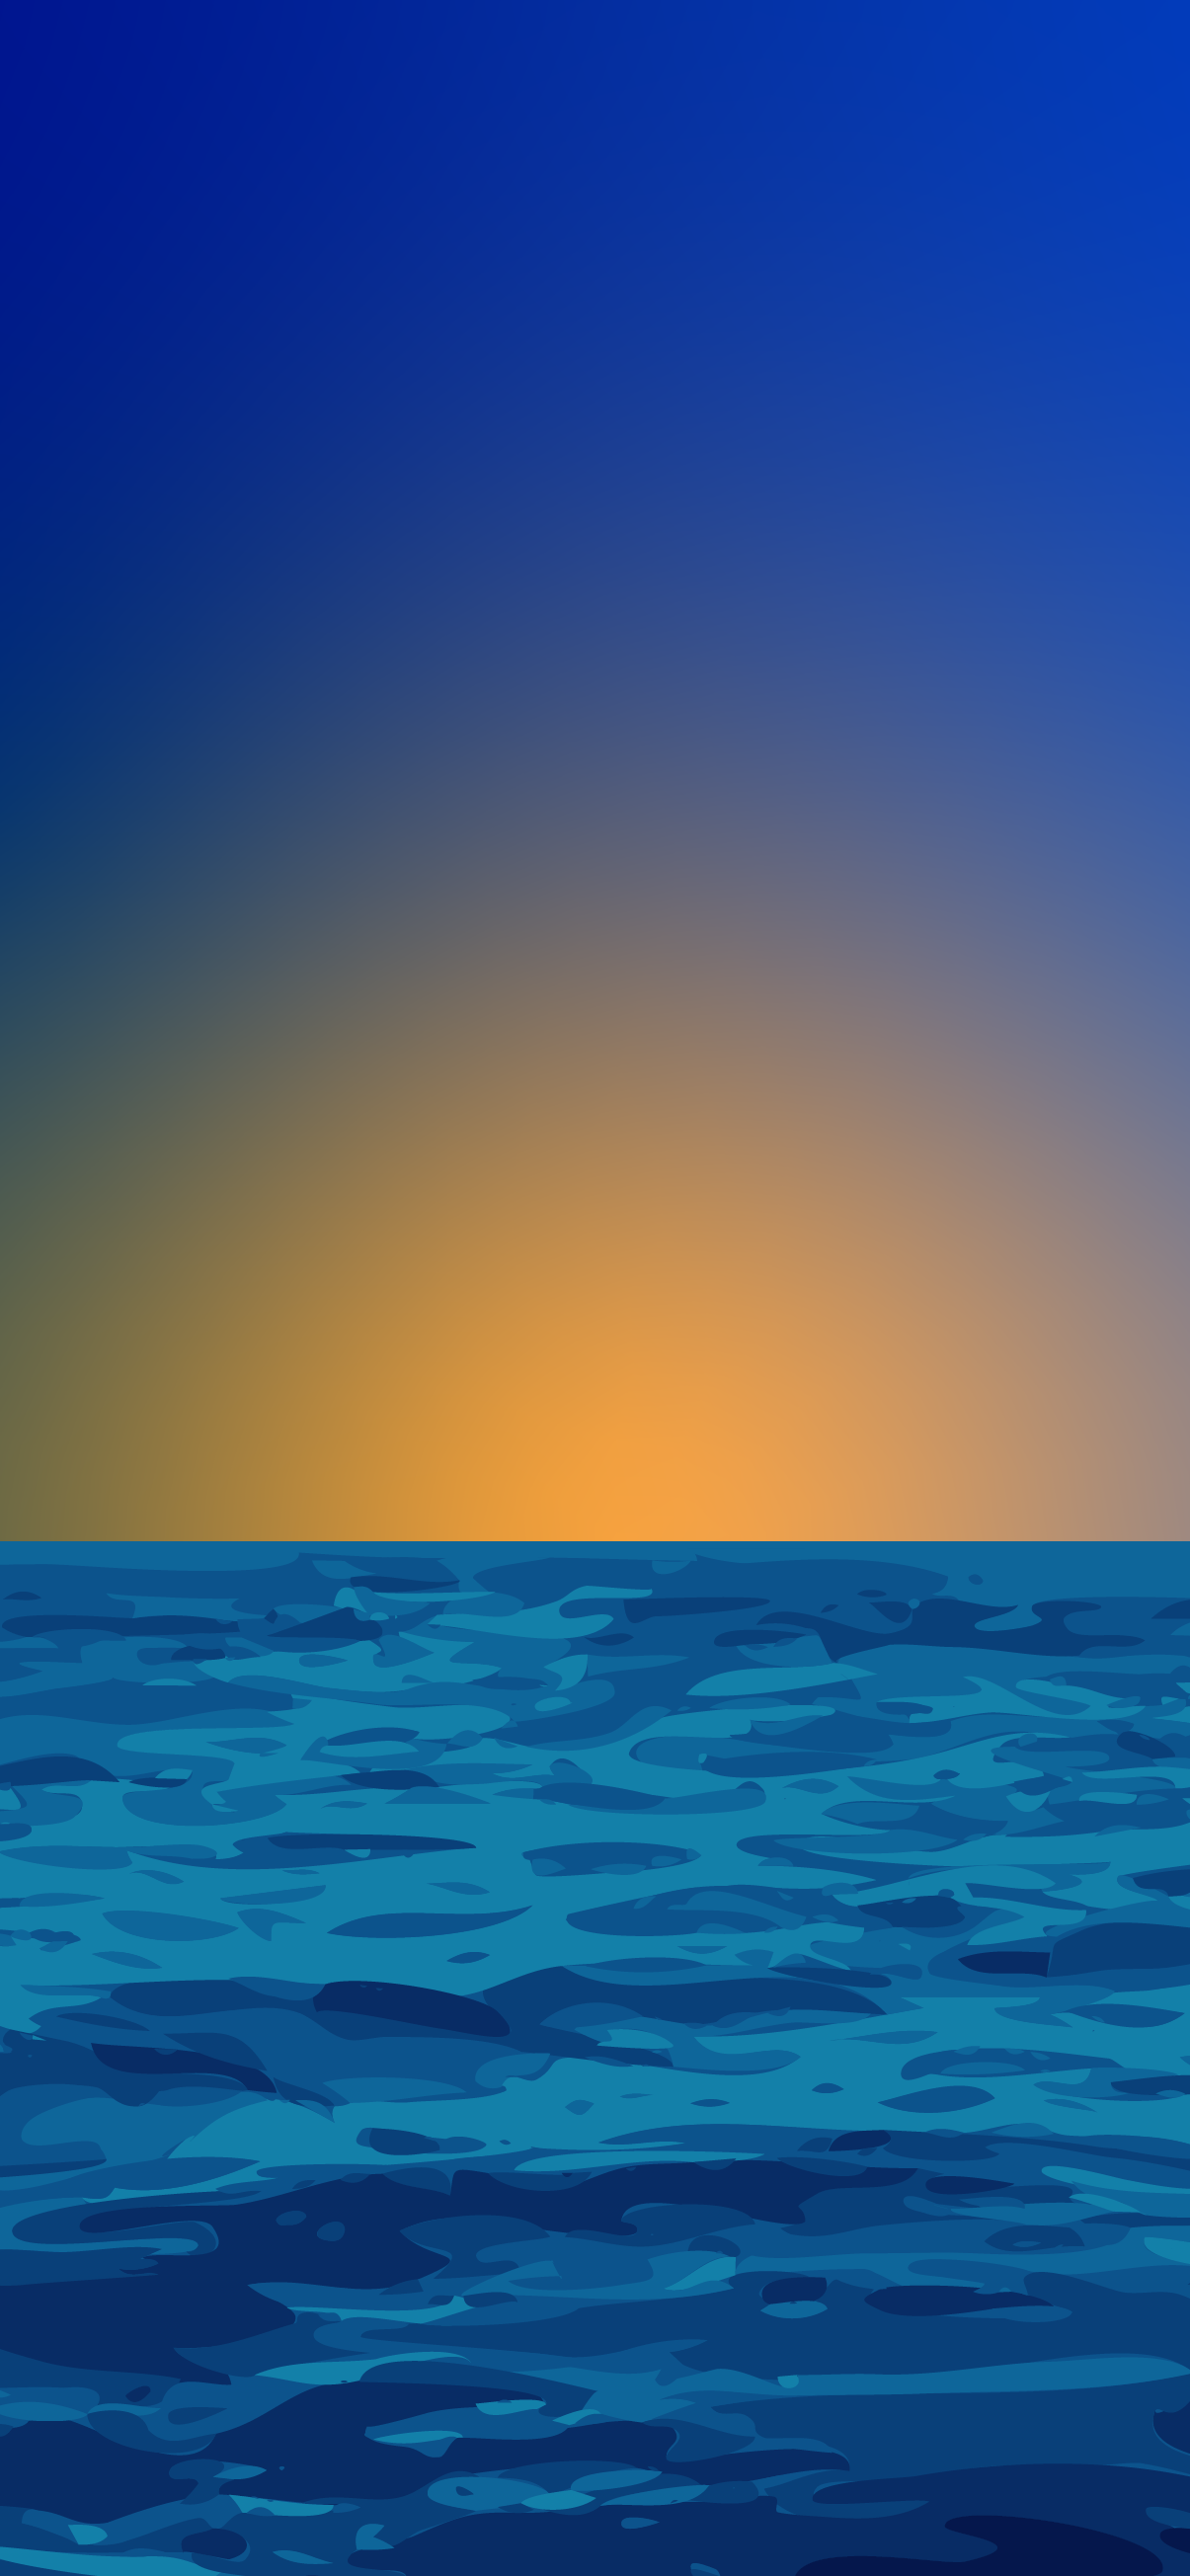 lockscreen background wallpaper simple ocean sea illustration hd